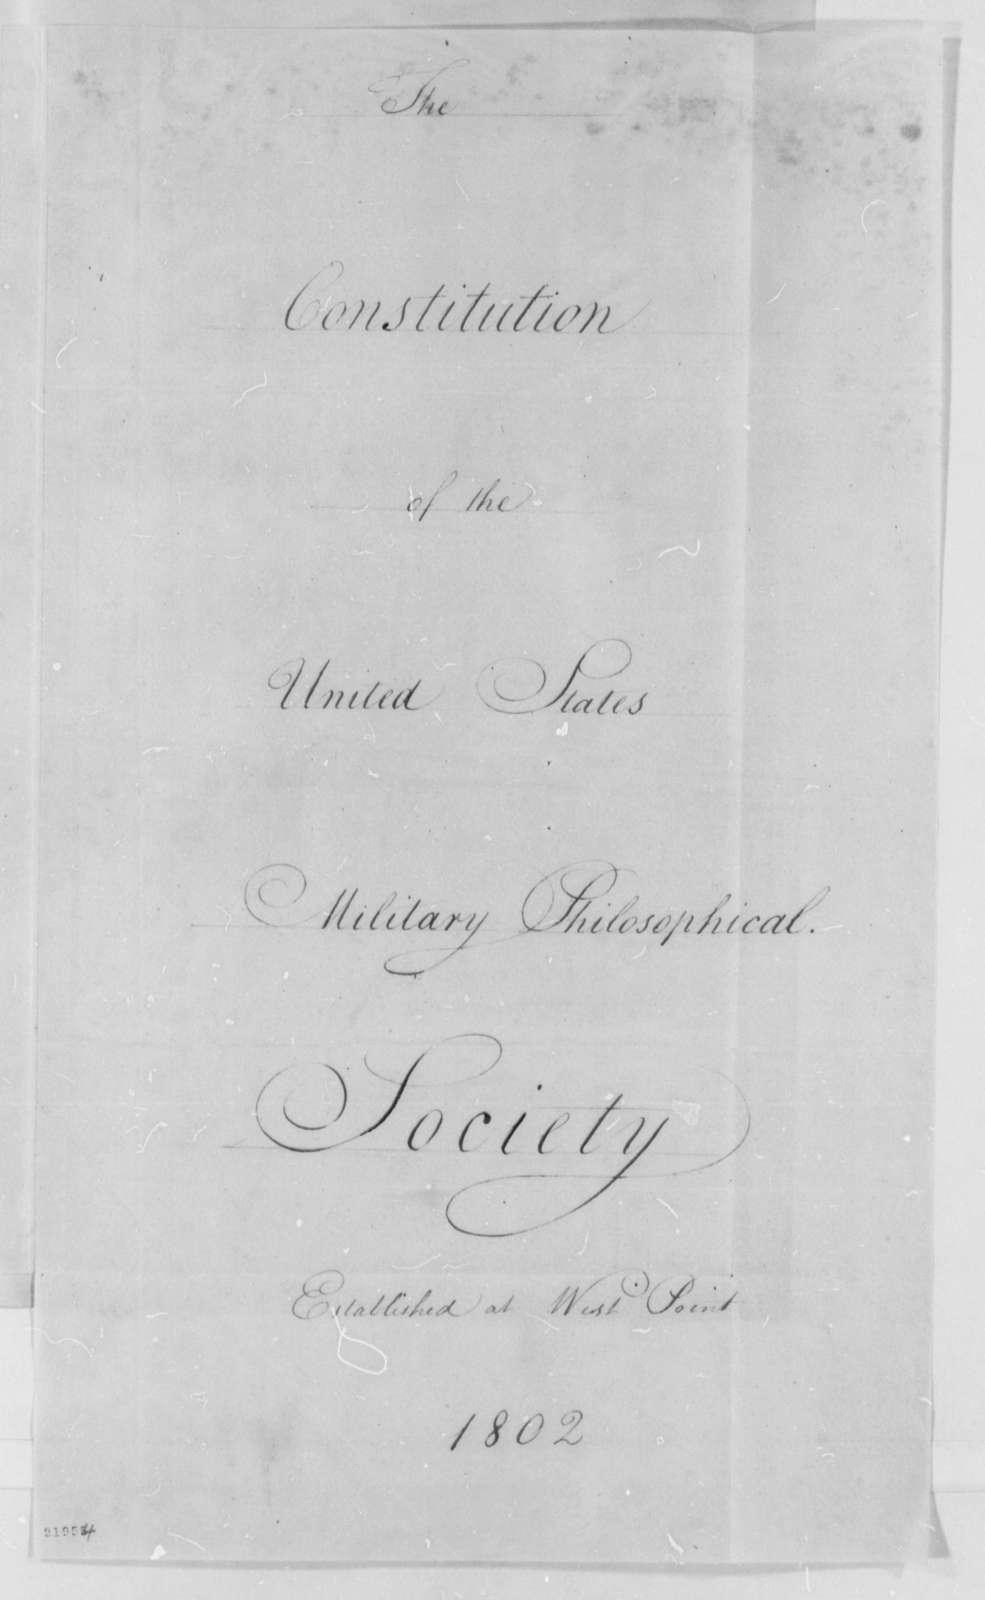 Military Philosophical Society, November 12, 1802